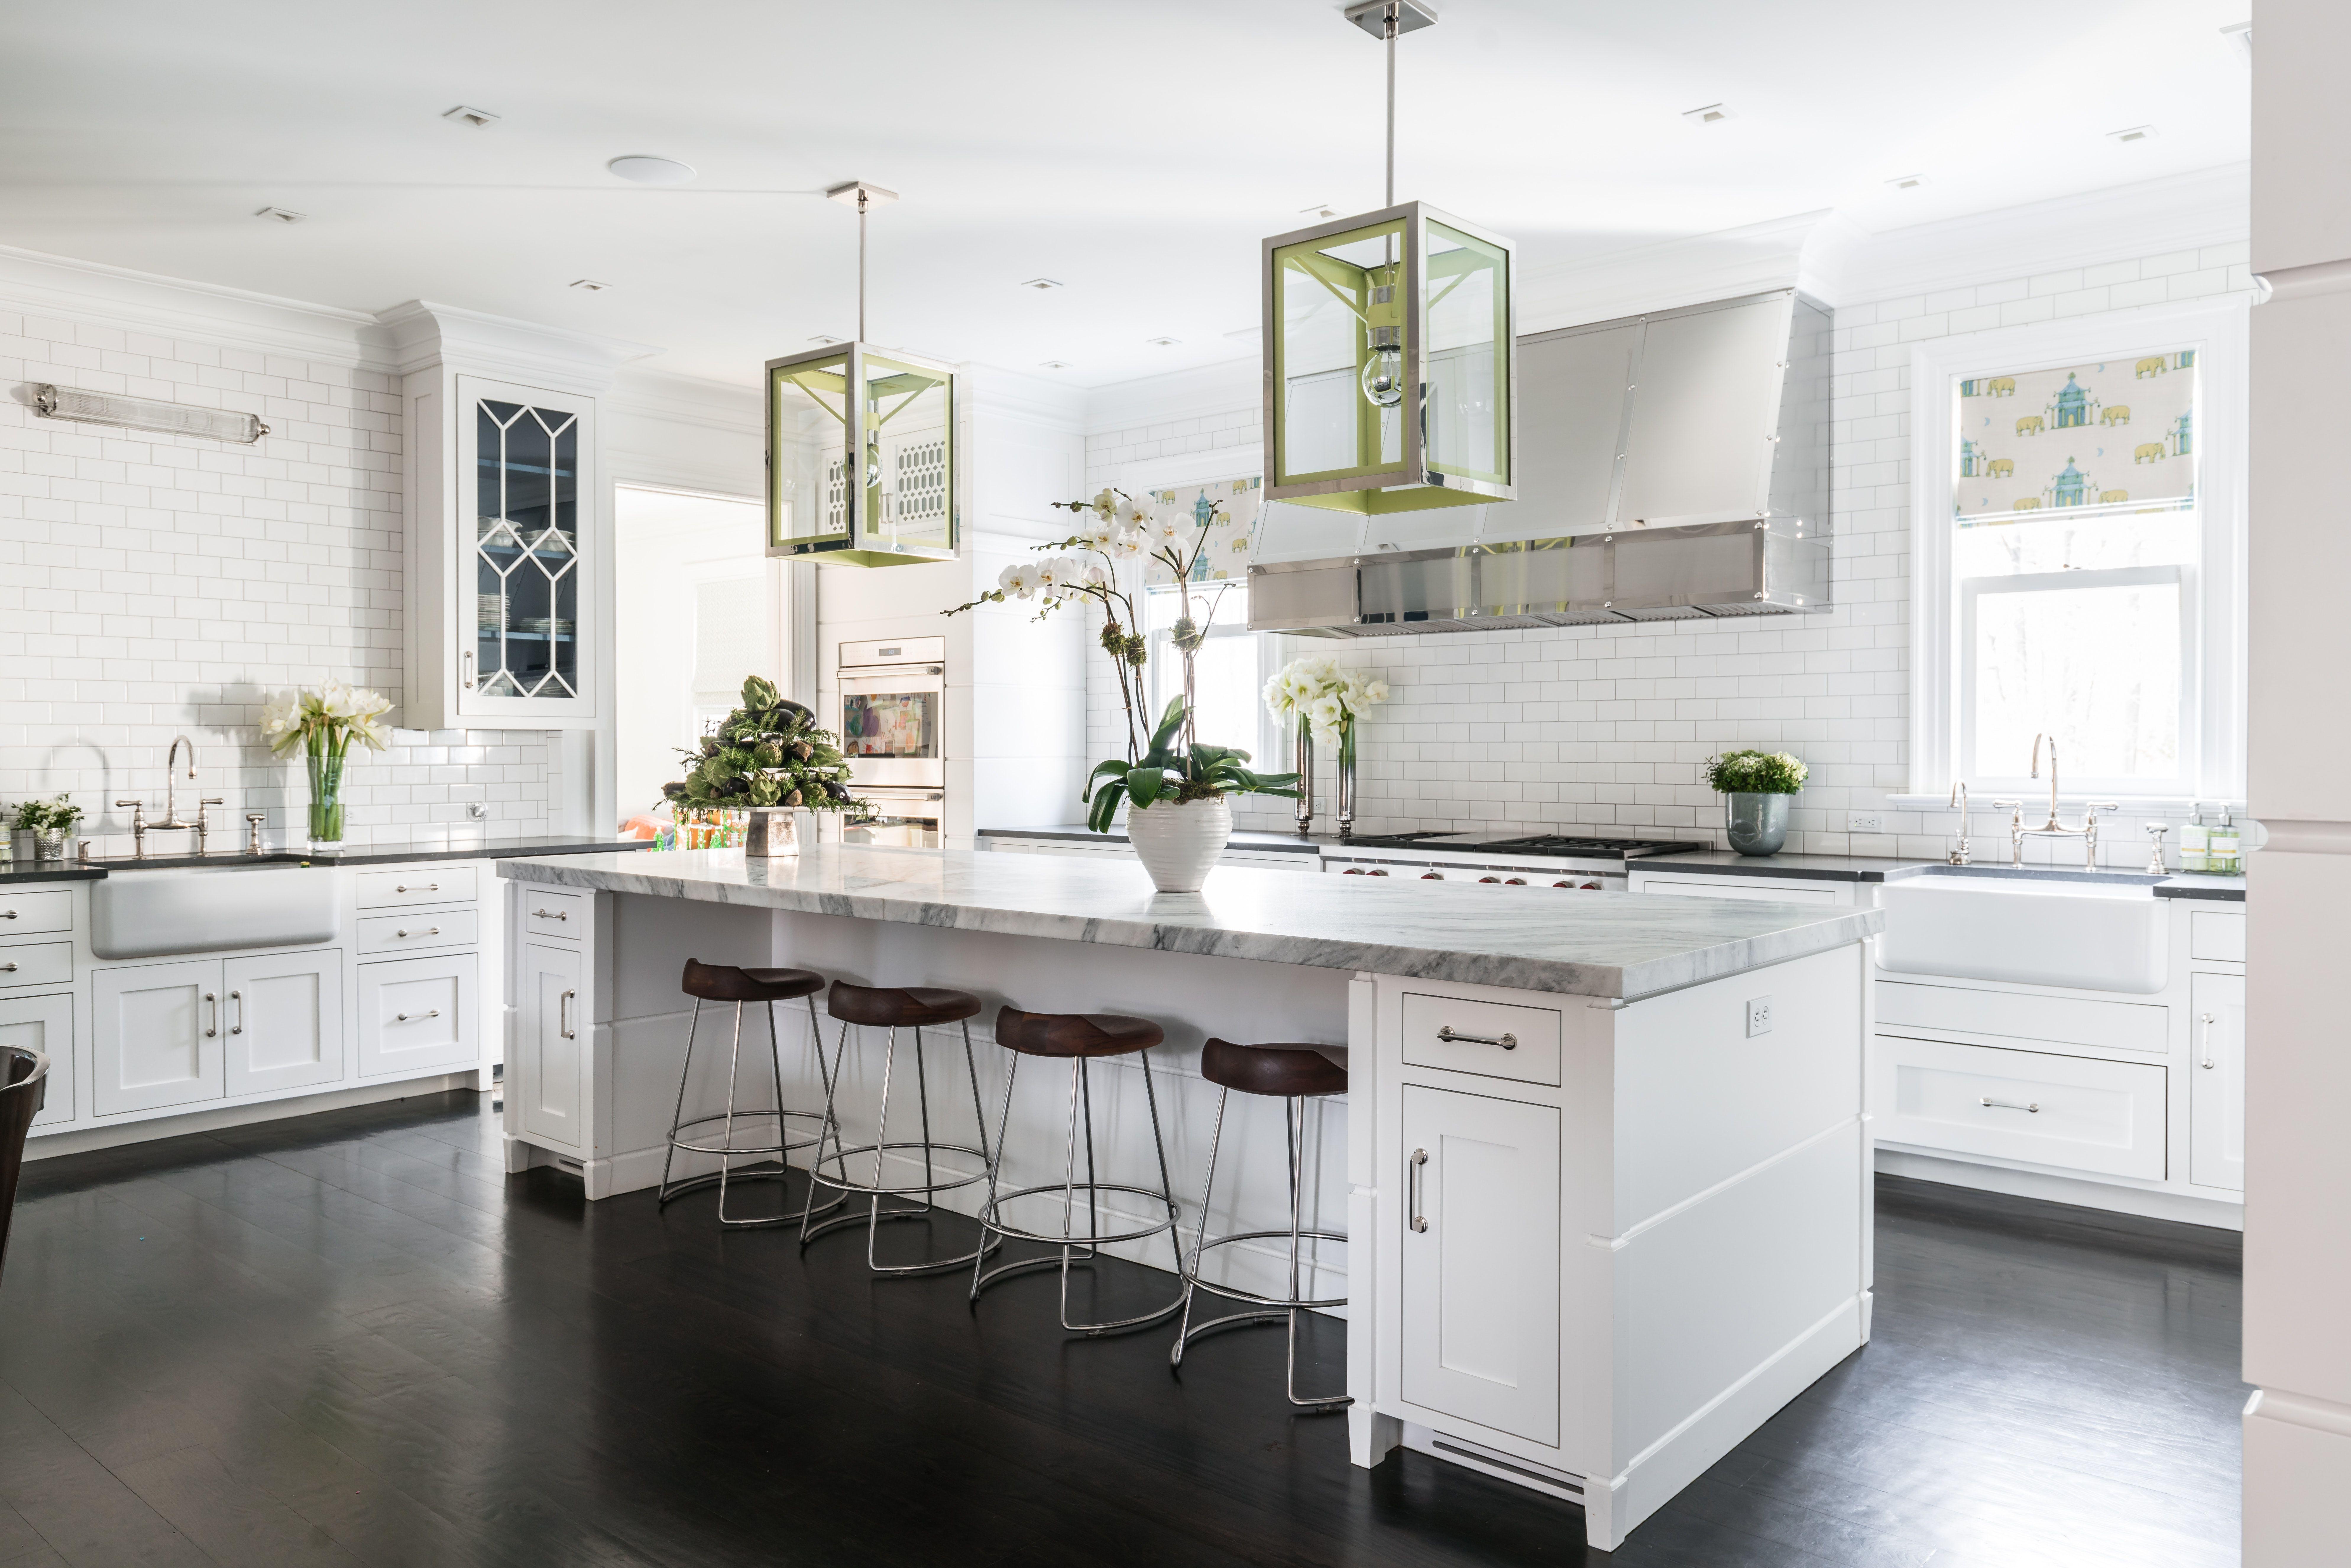 Large Kitchen Island With Stools White Kitchen Remodeling White Kitchen Design Kitchen Remodel